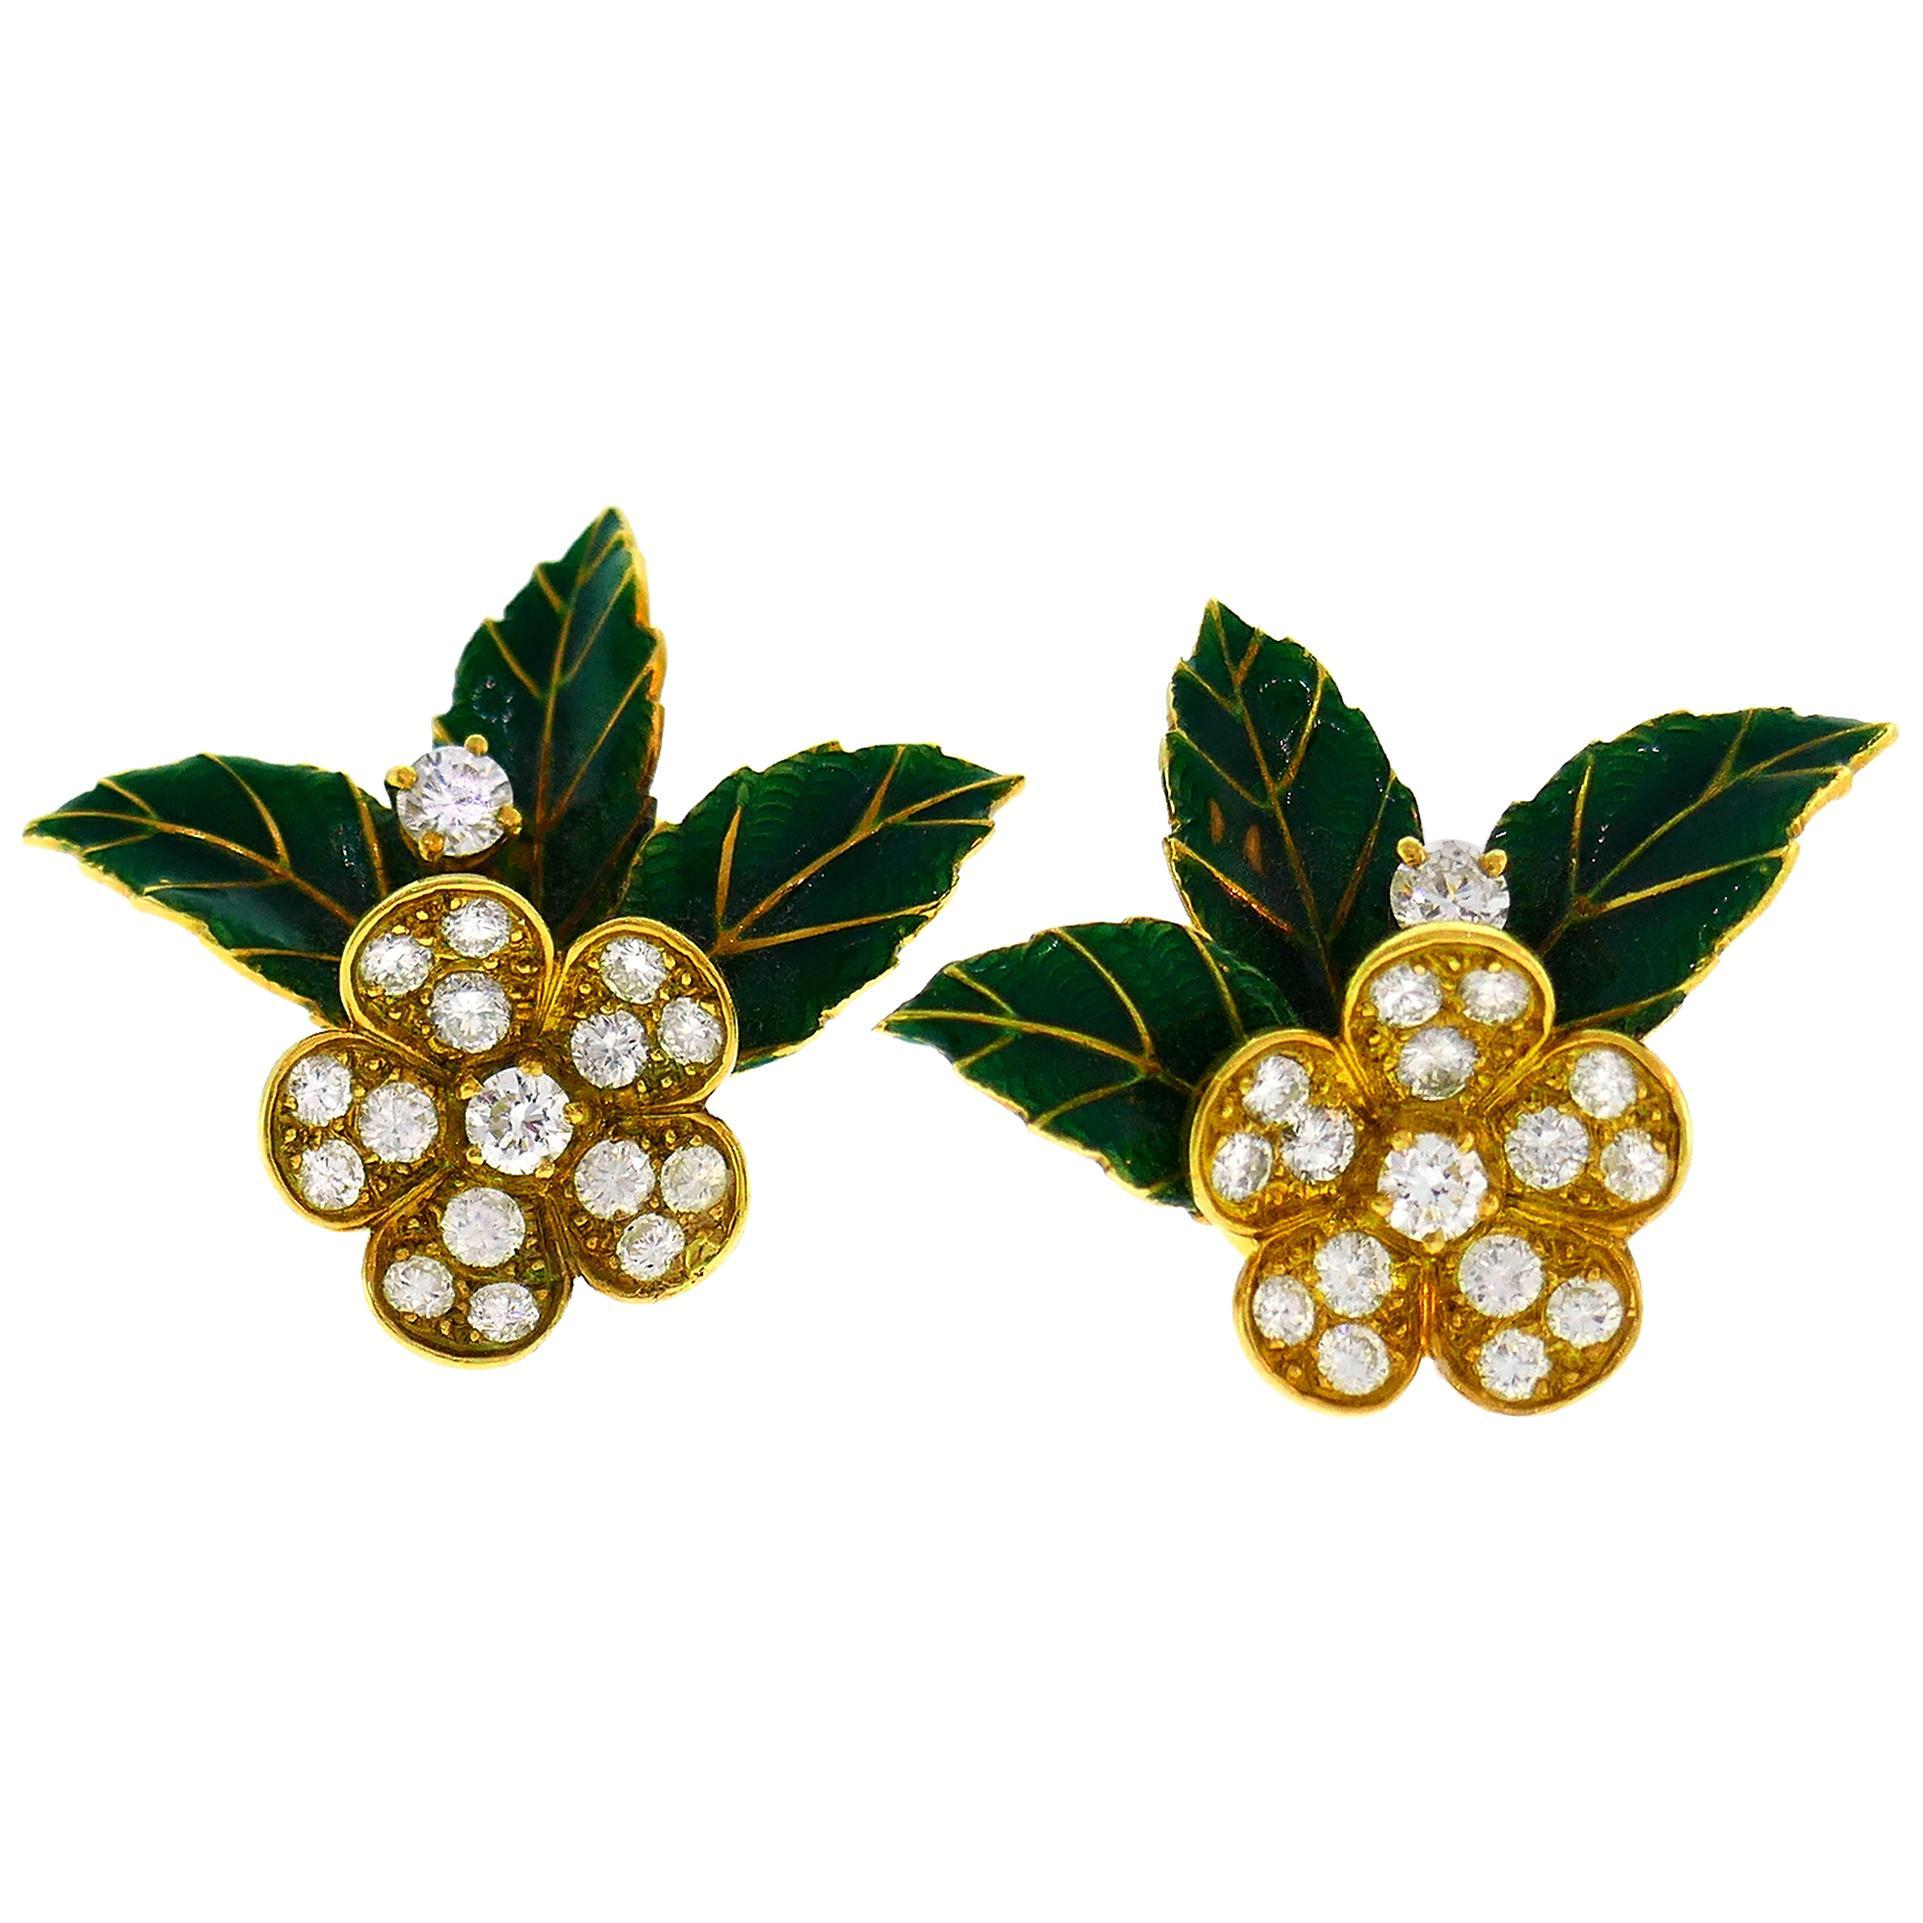 Boucheron Diamond Enamel Gold Earrings, 1950s, France